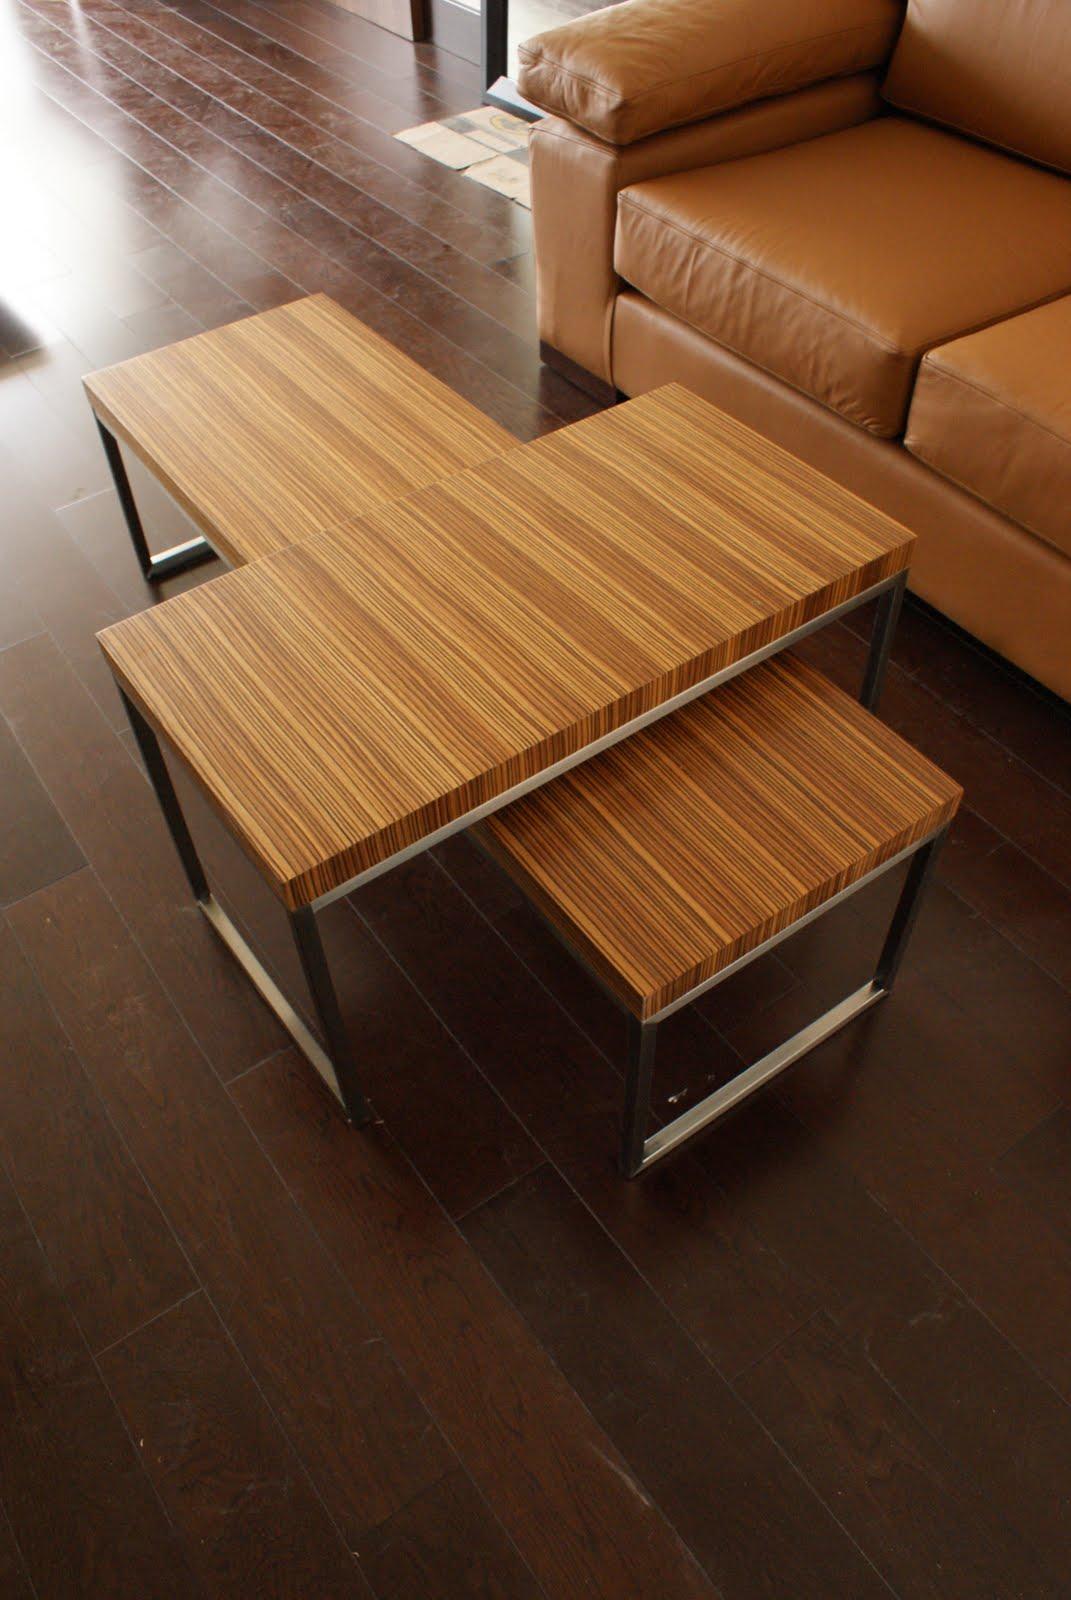 Muebles sobre dise o avl mesas de centro for Muebles sobre diseno